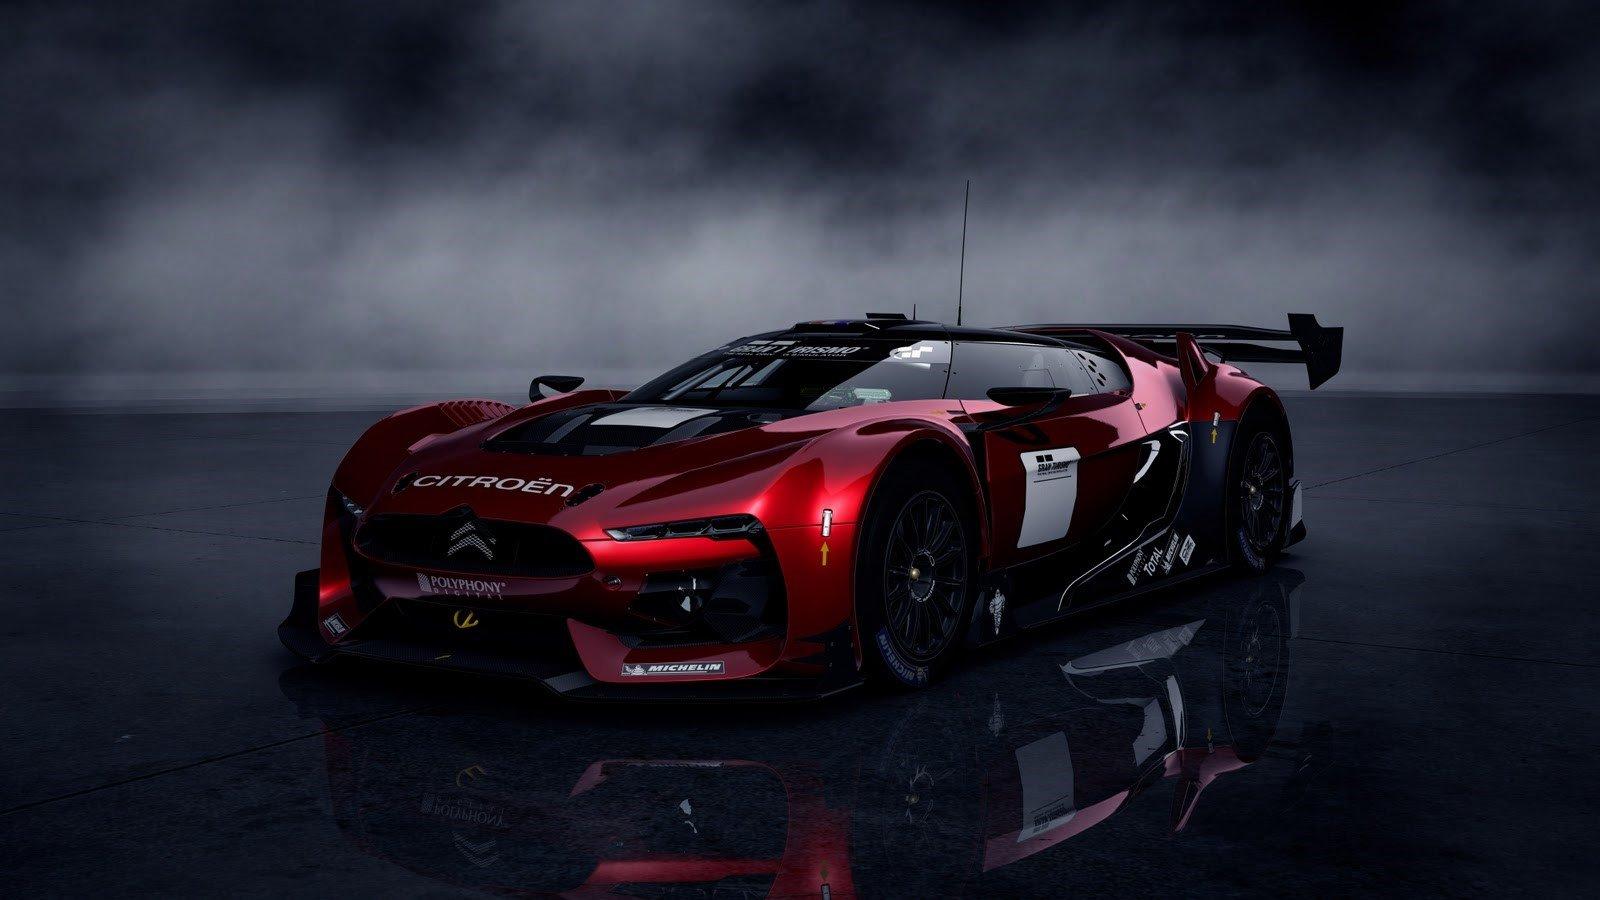 Wallpaper Gran Turismo 5 Citroen GT